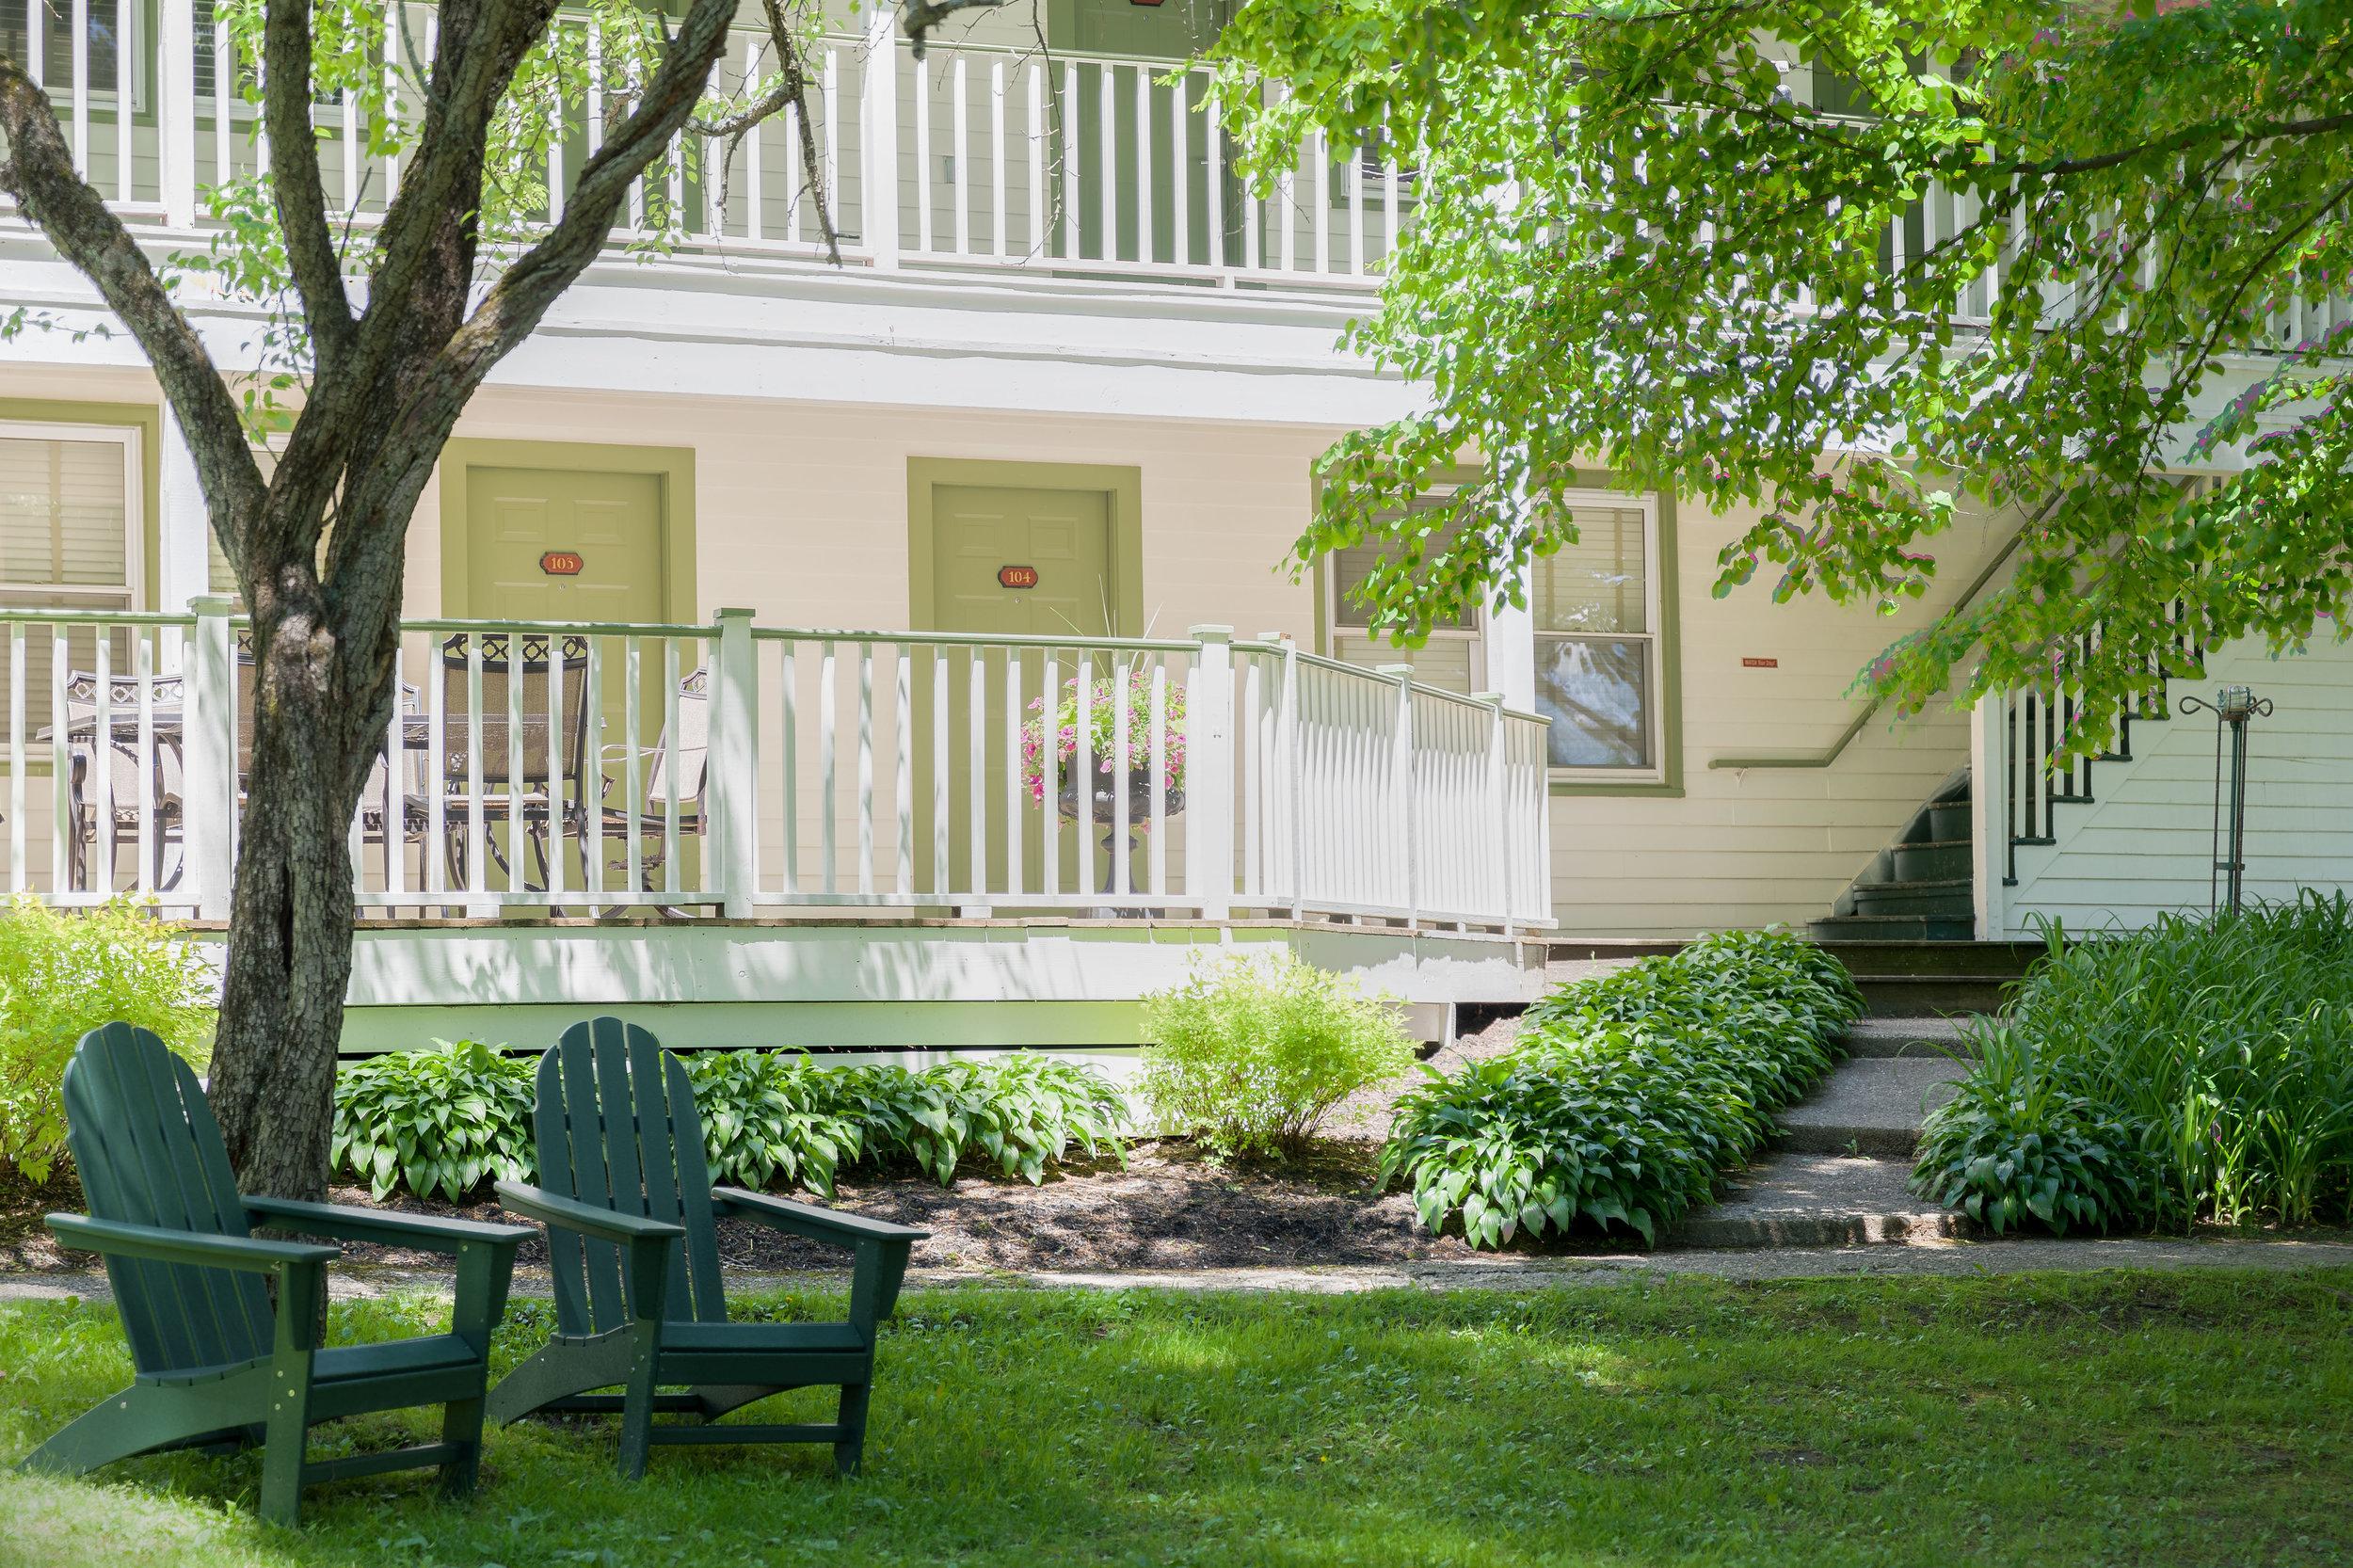 103.jpg Terrace Bldg Lawn with Adirondak Chairs.jpg